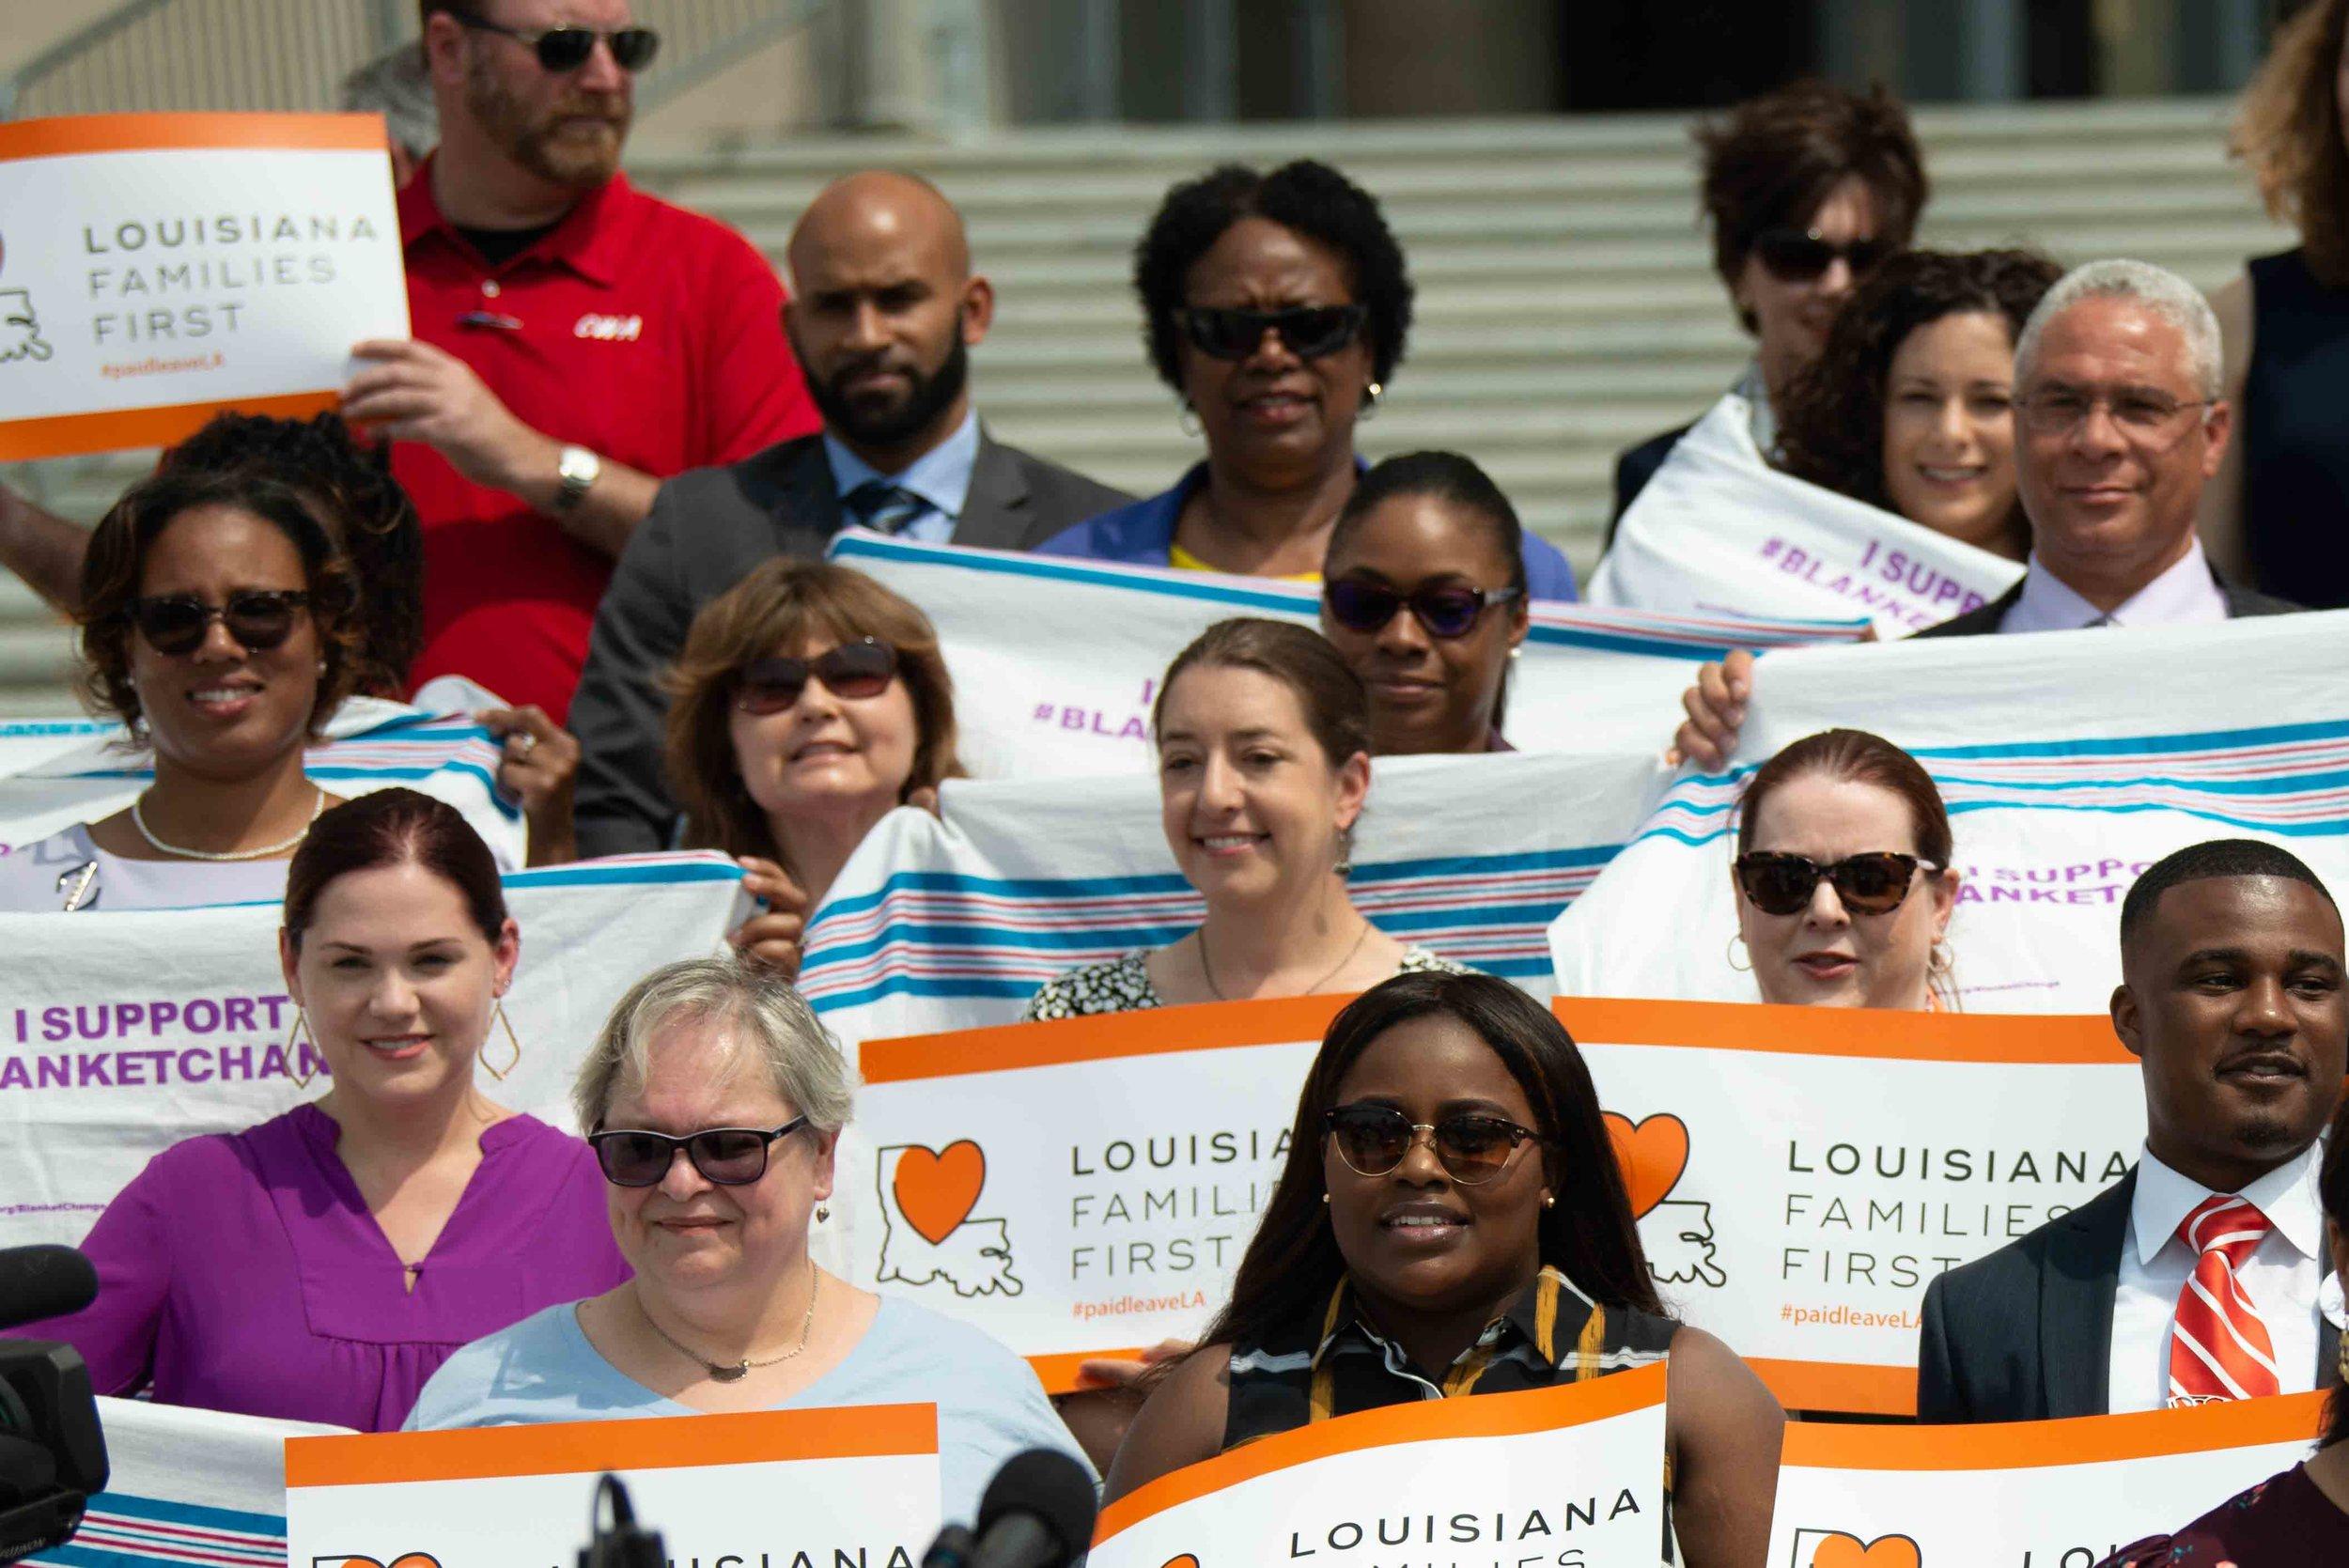 Louisiana Families First-53.jpg